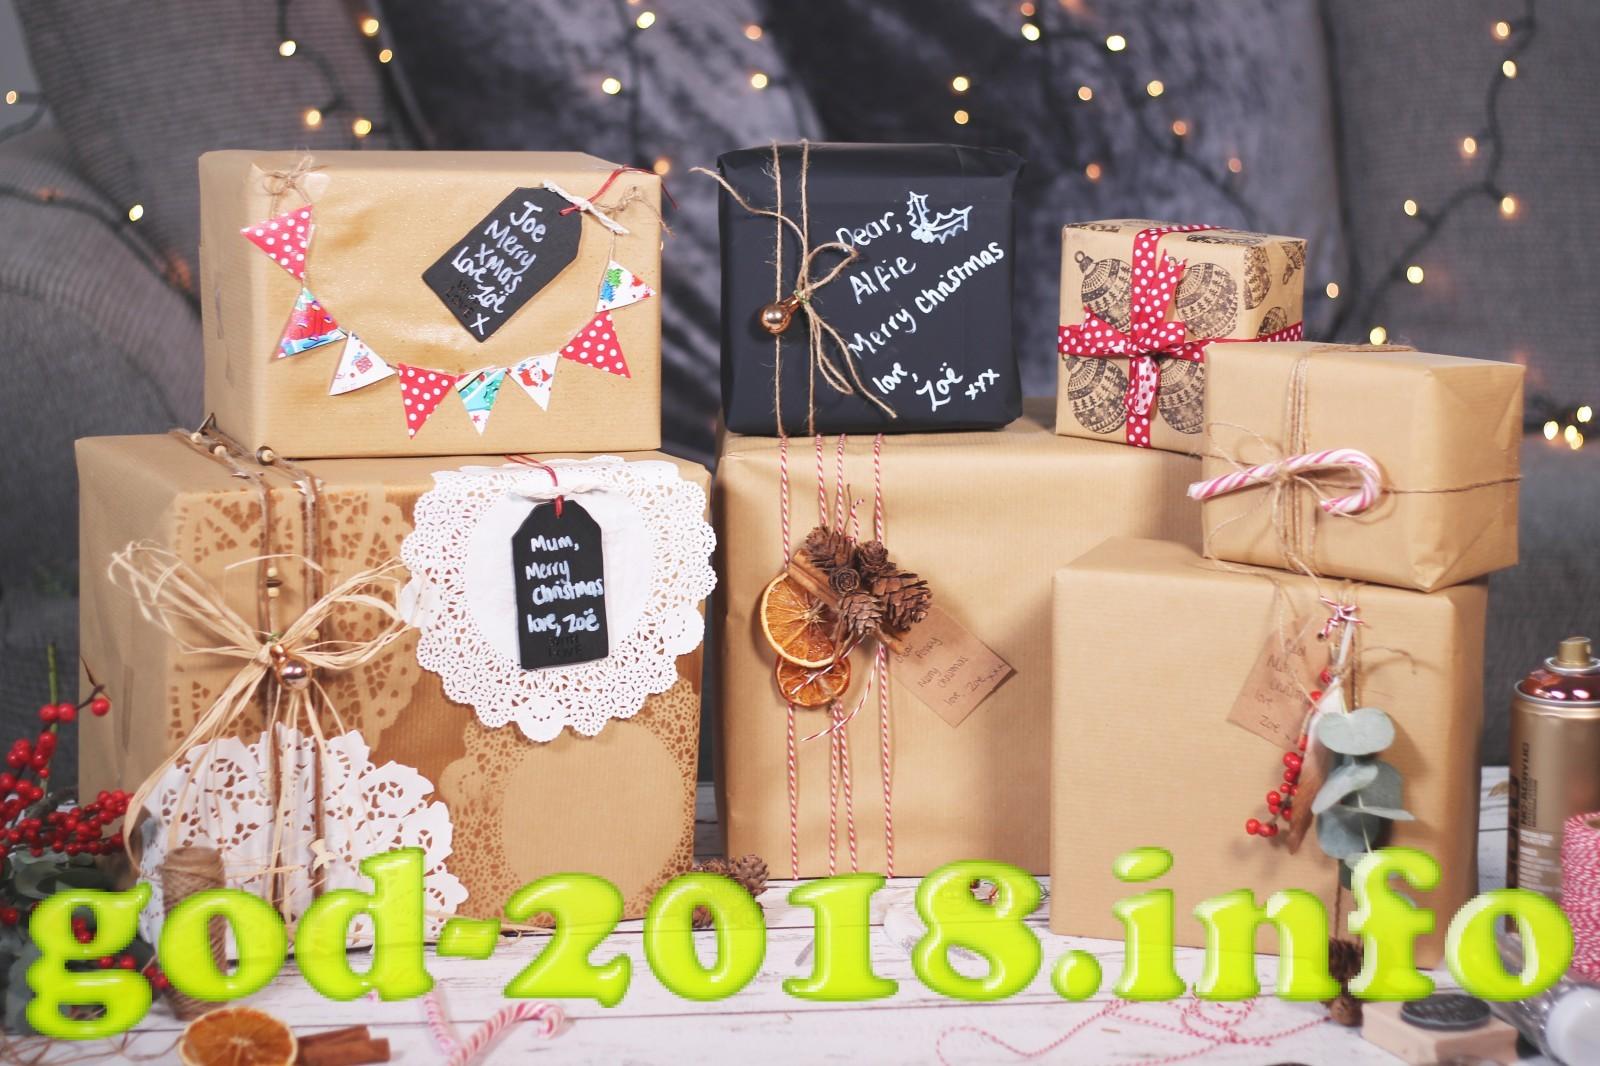 interesnye-pozdravlenija-s-novym-godom-2018-dlja-ljubimoj